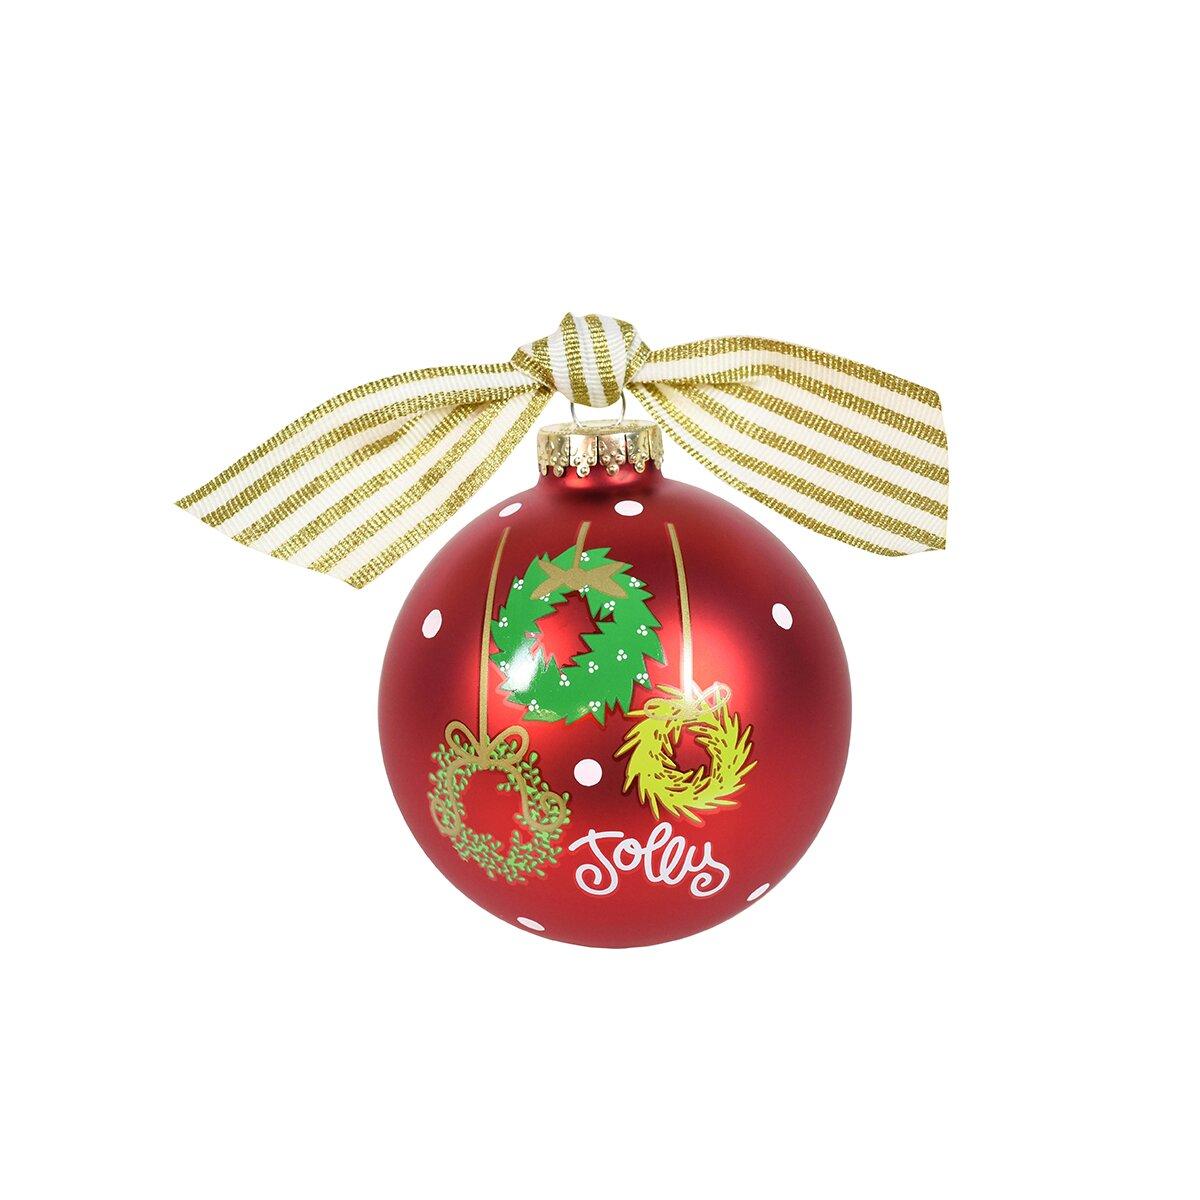 coton colors hanging wreaths glass ornament wayfair